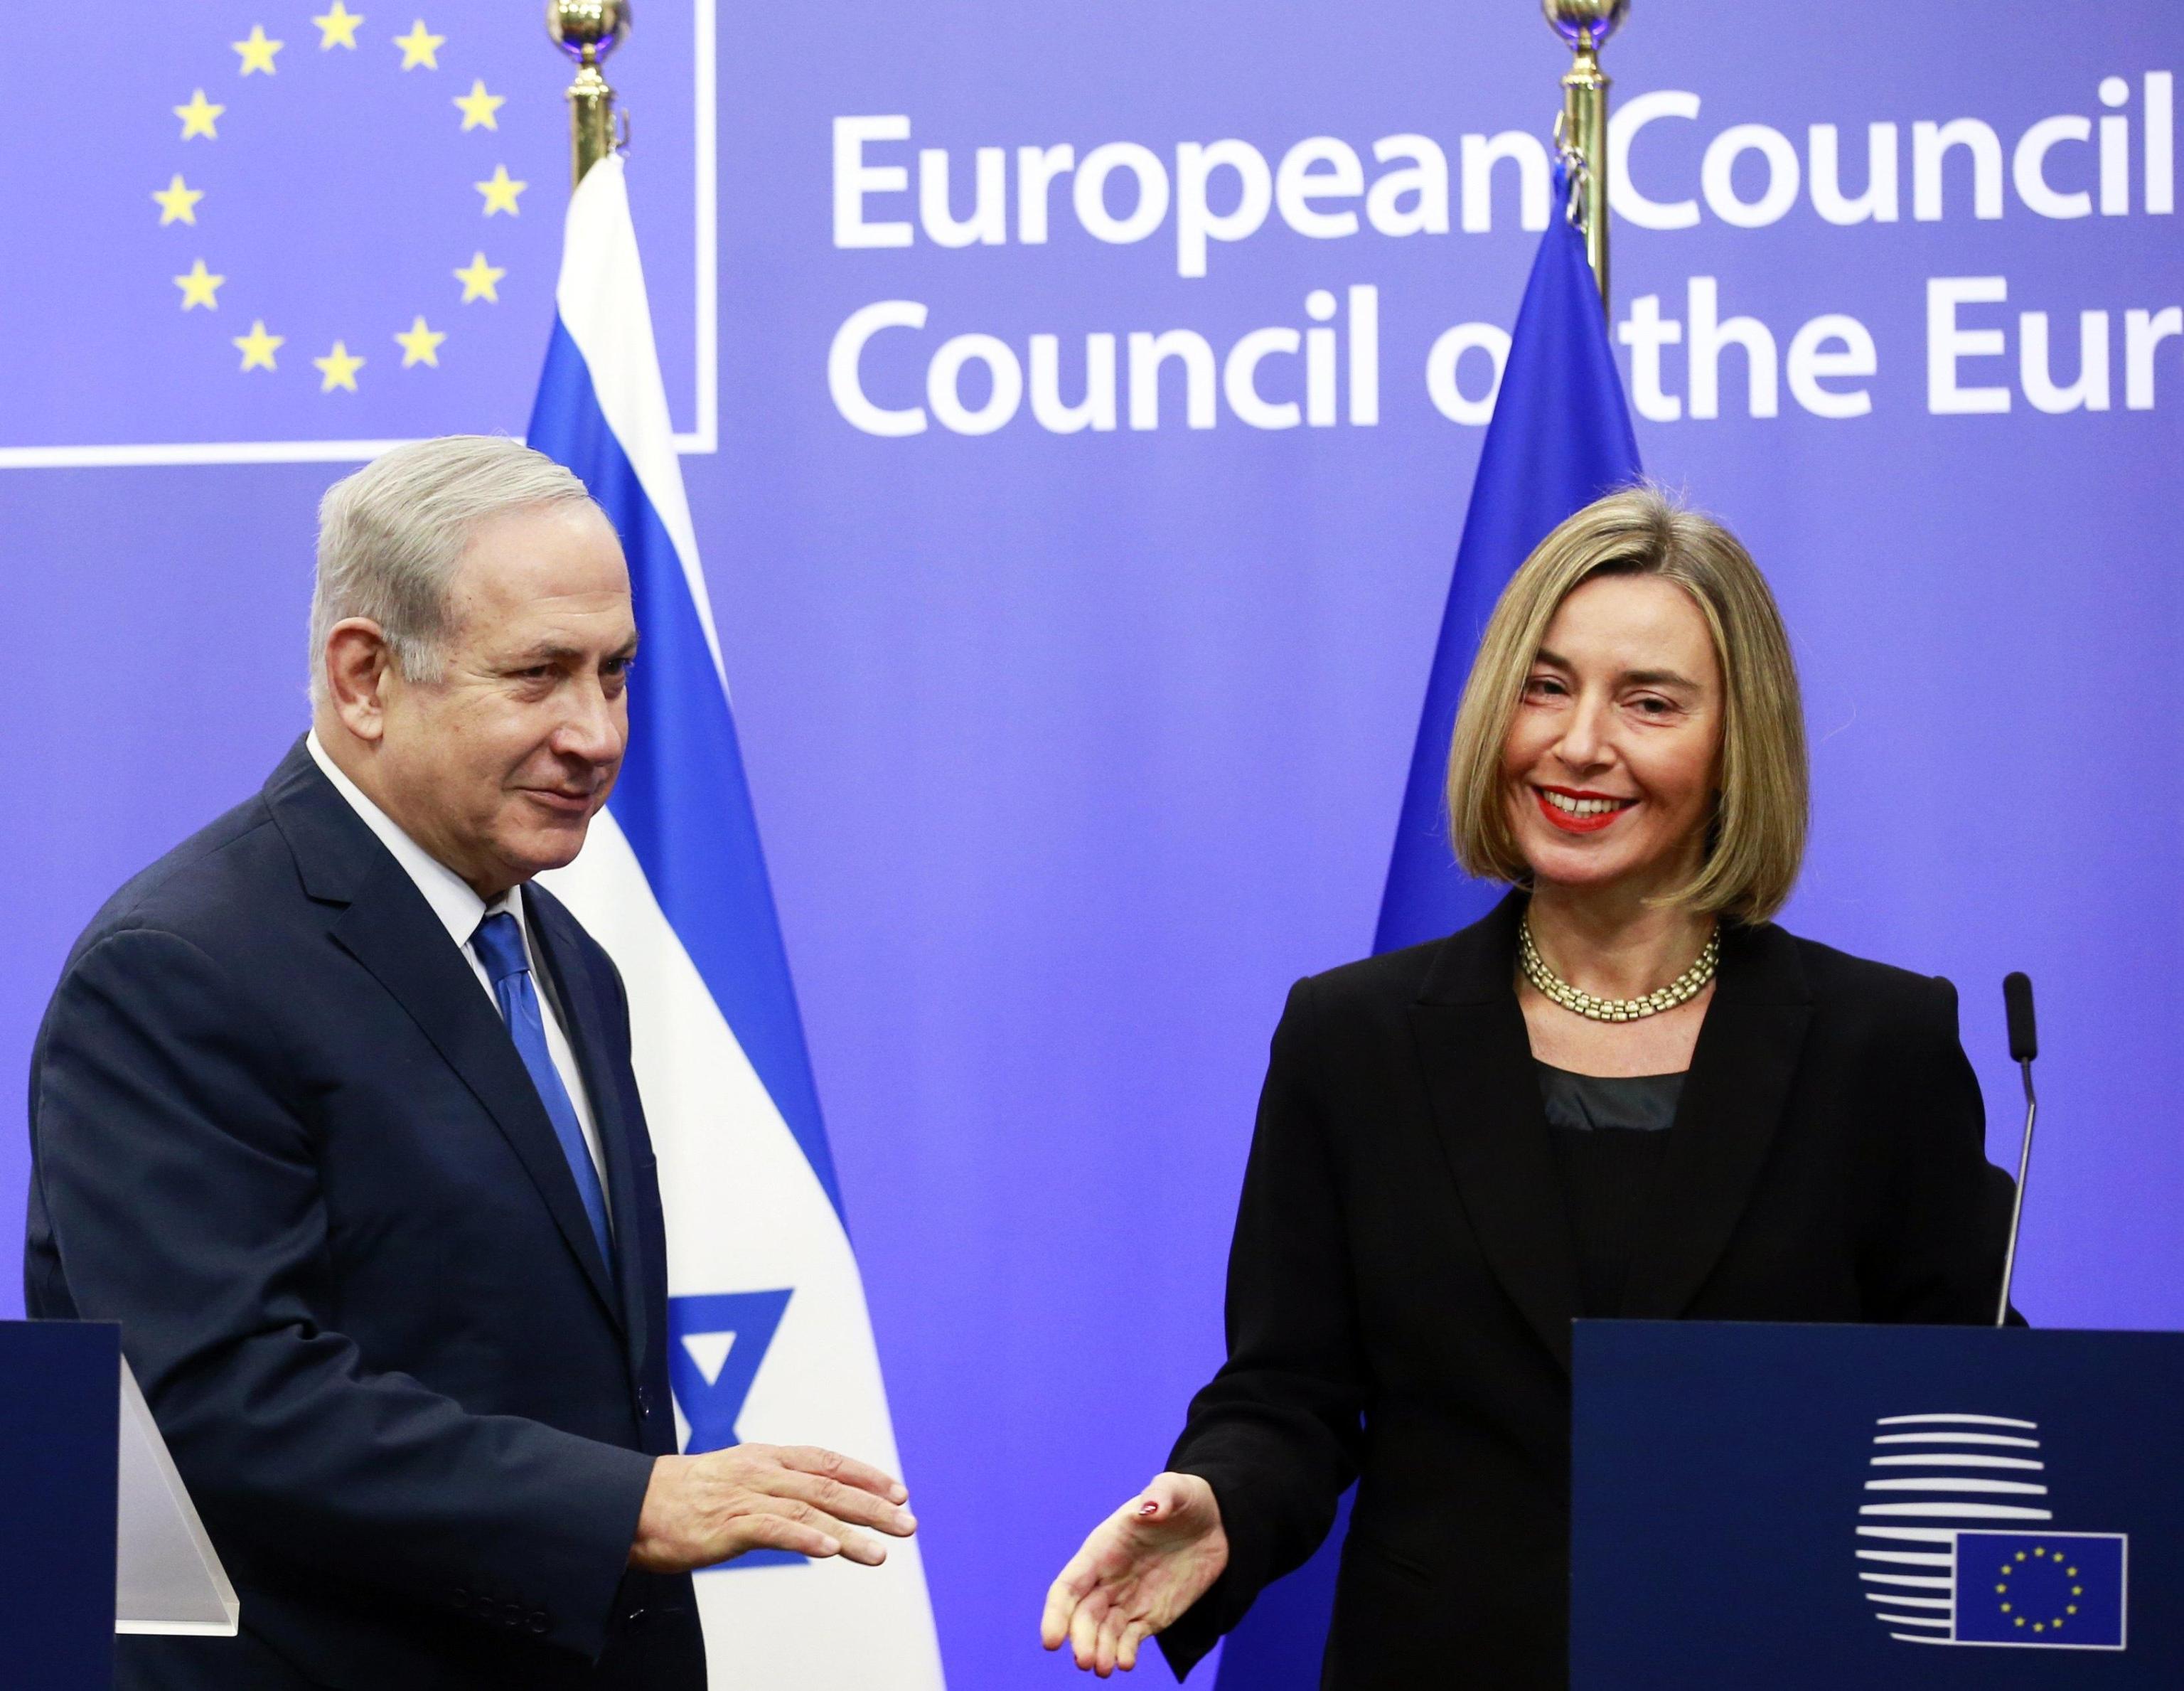 Netanyahu, per pace riconoscere realtà